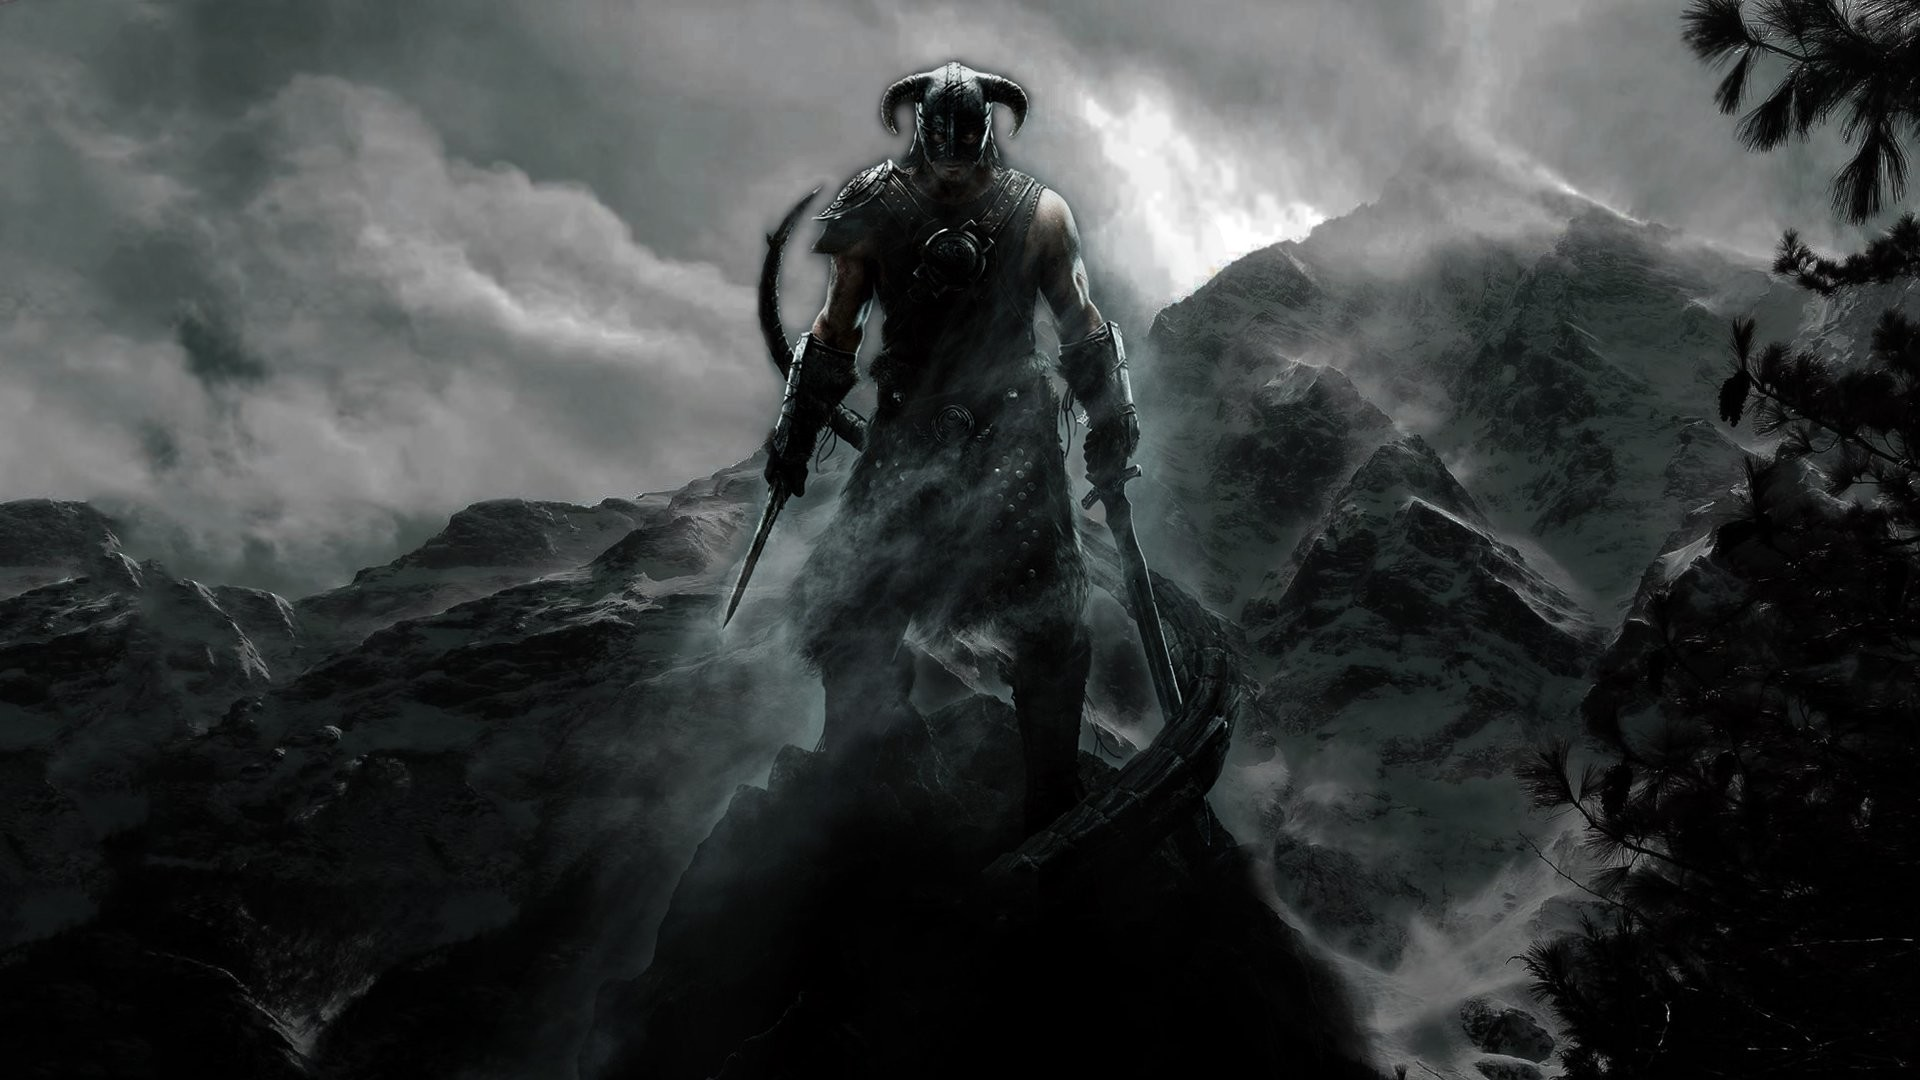 Skyrim Dragonborn Mage Desktop Wallpaper by grambocrackah on